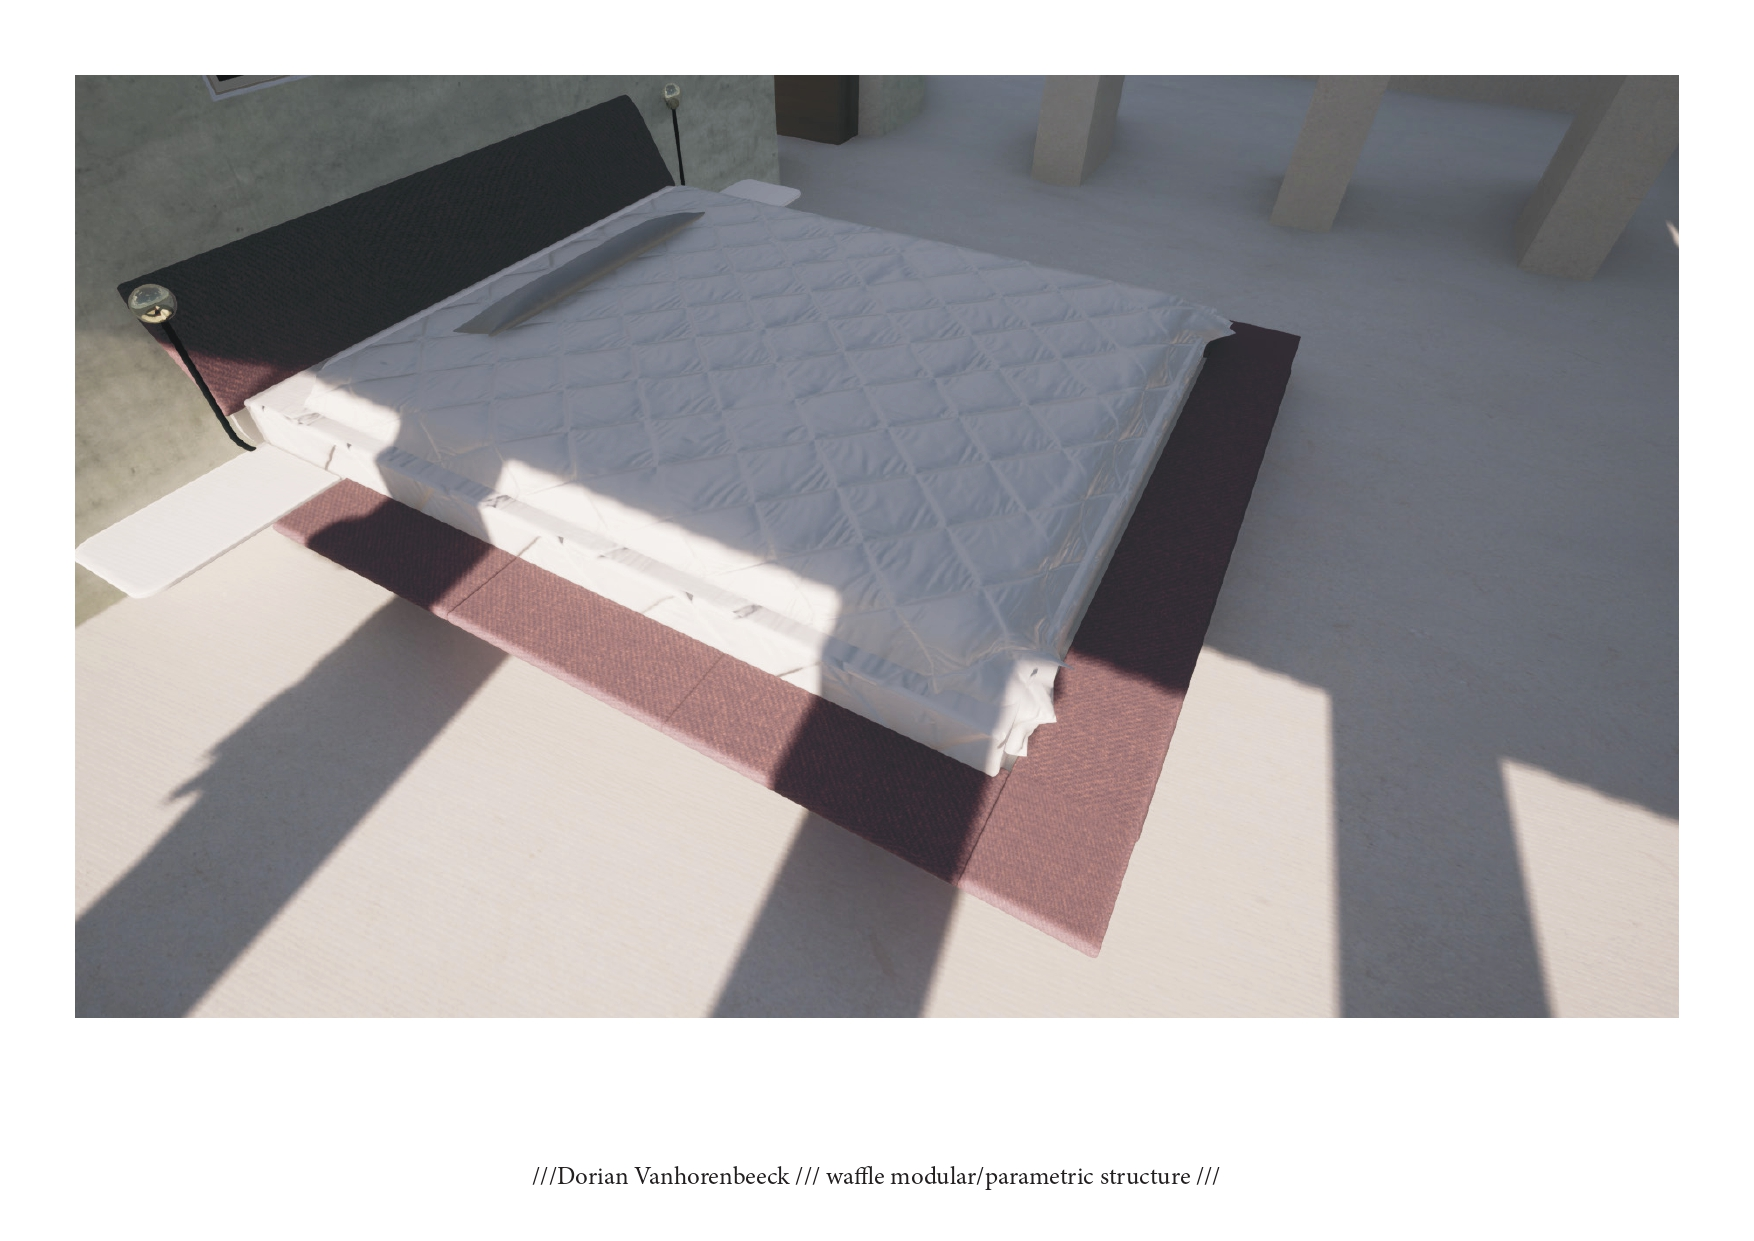 Livret Waffle modular-parametric Structure Dorian Vanhorenbeeck_page-0018